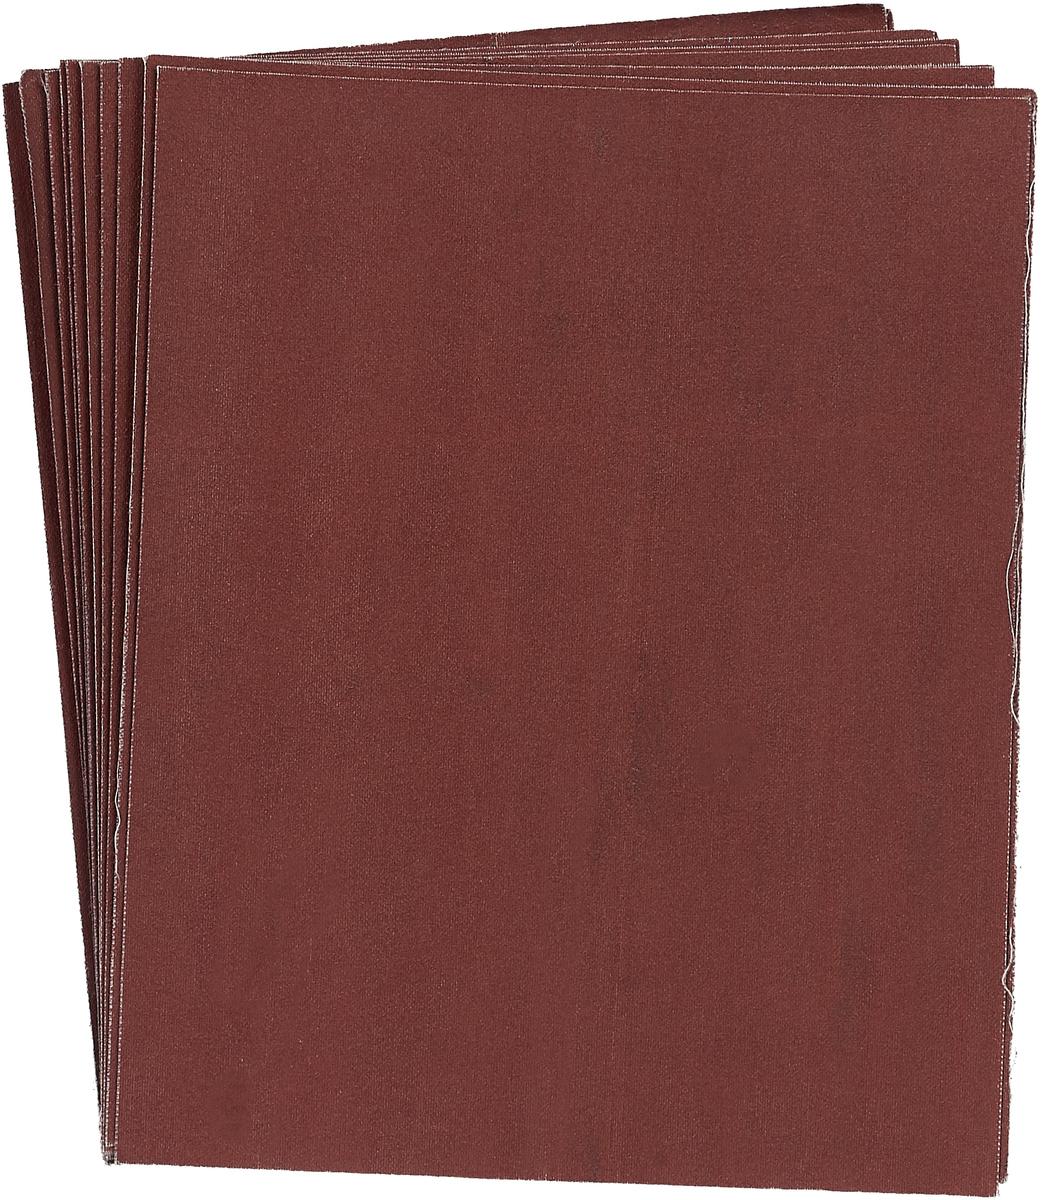 Бумага наждачная на тканевой основе Fir, 23 х 28 см, 10 шт, Р180 бумага наждачная fit 11 5 х 5 м р150